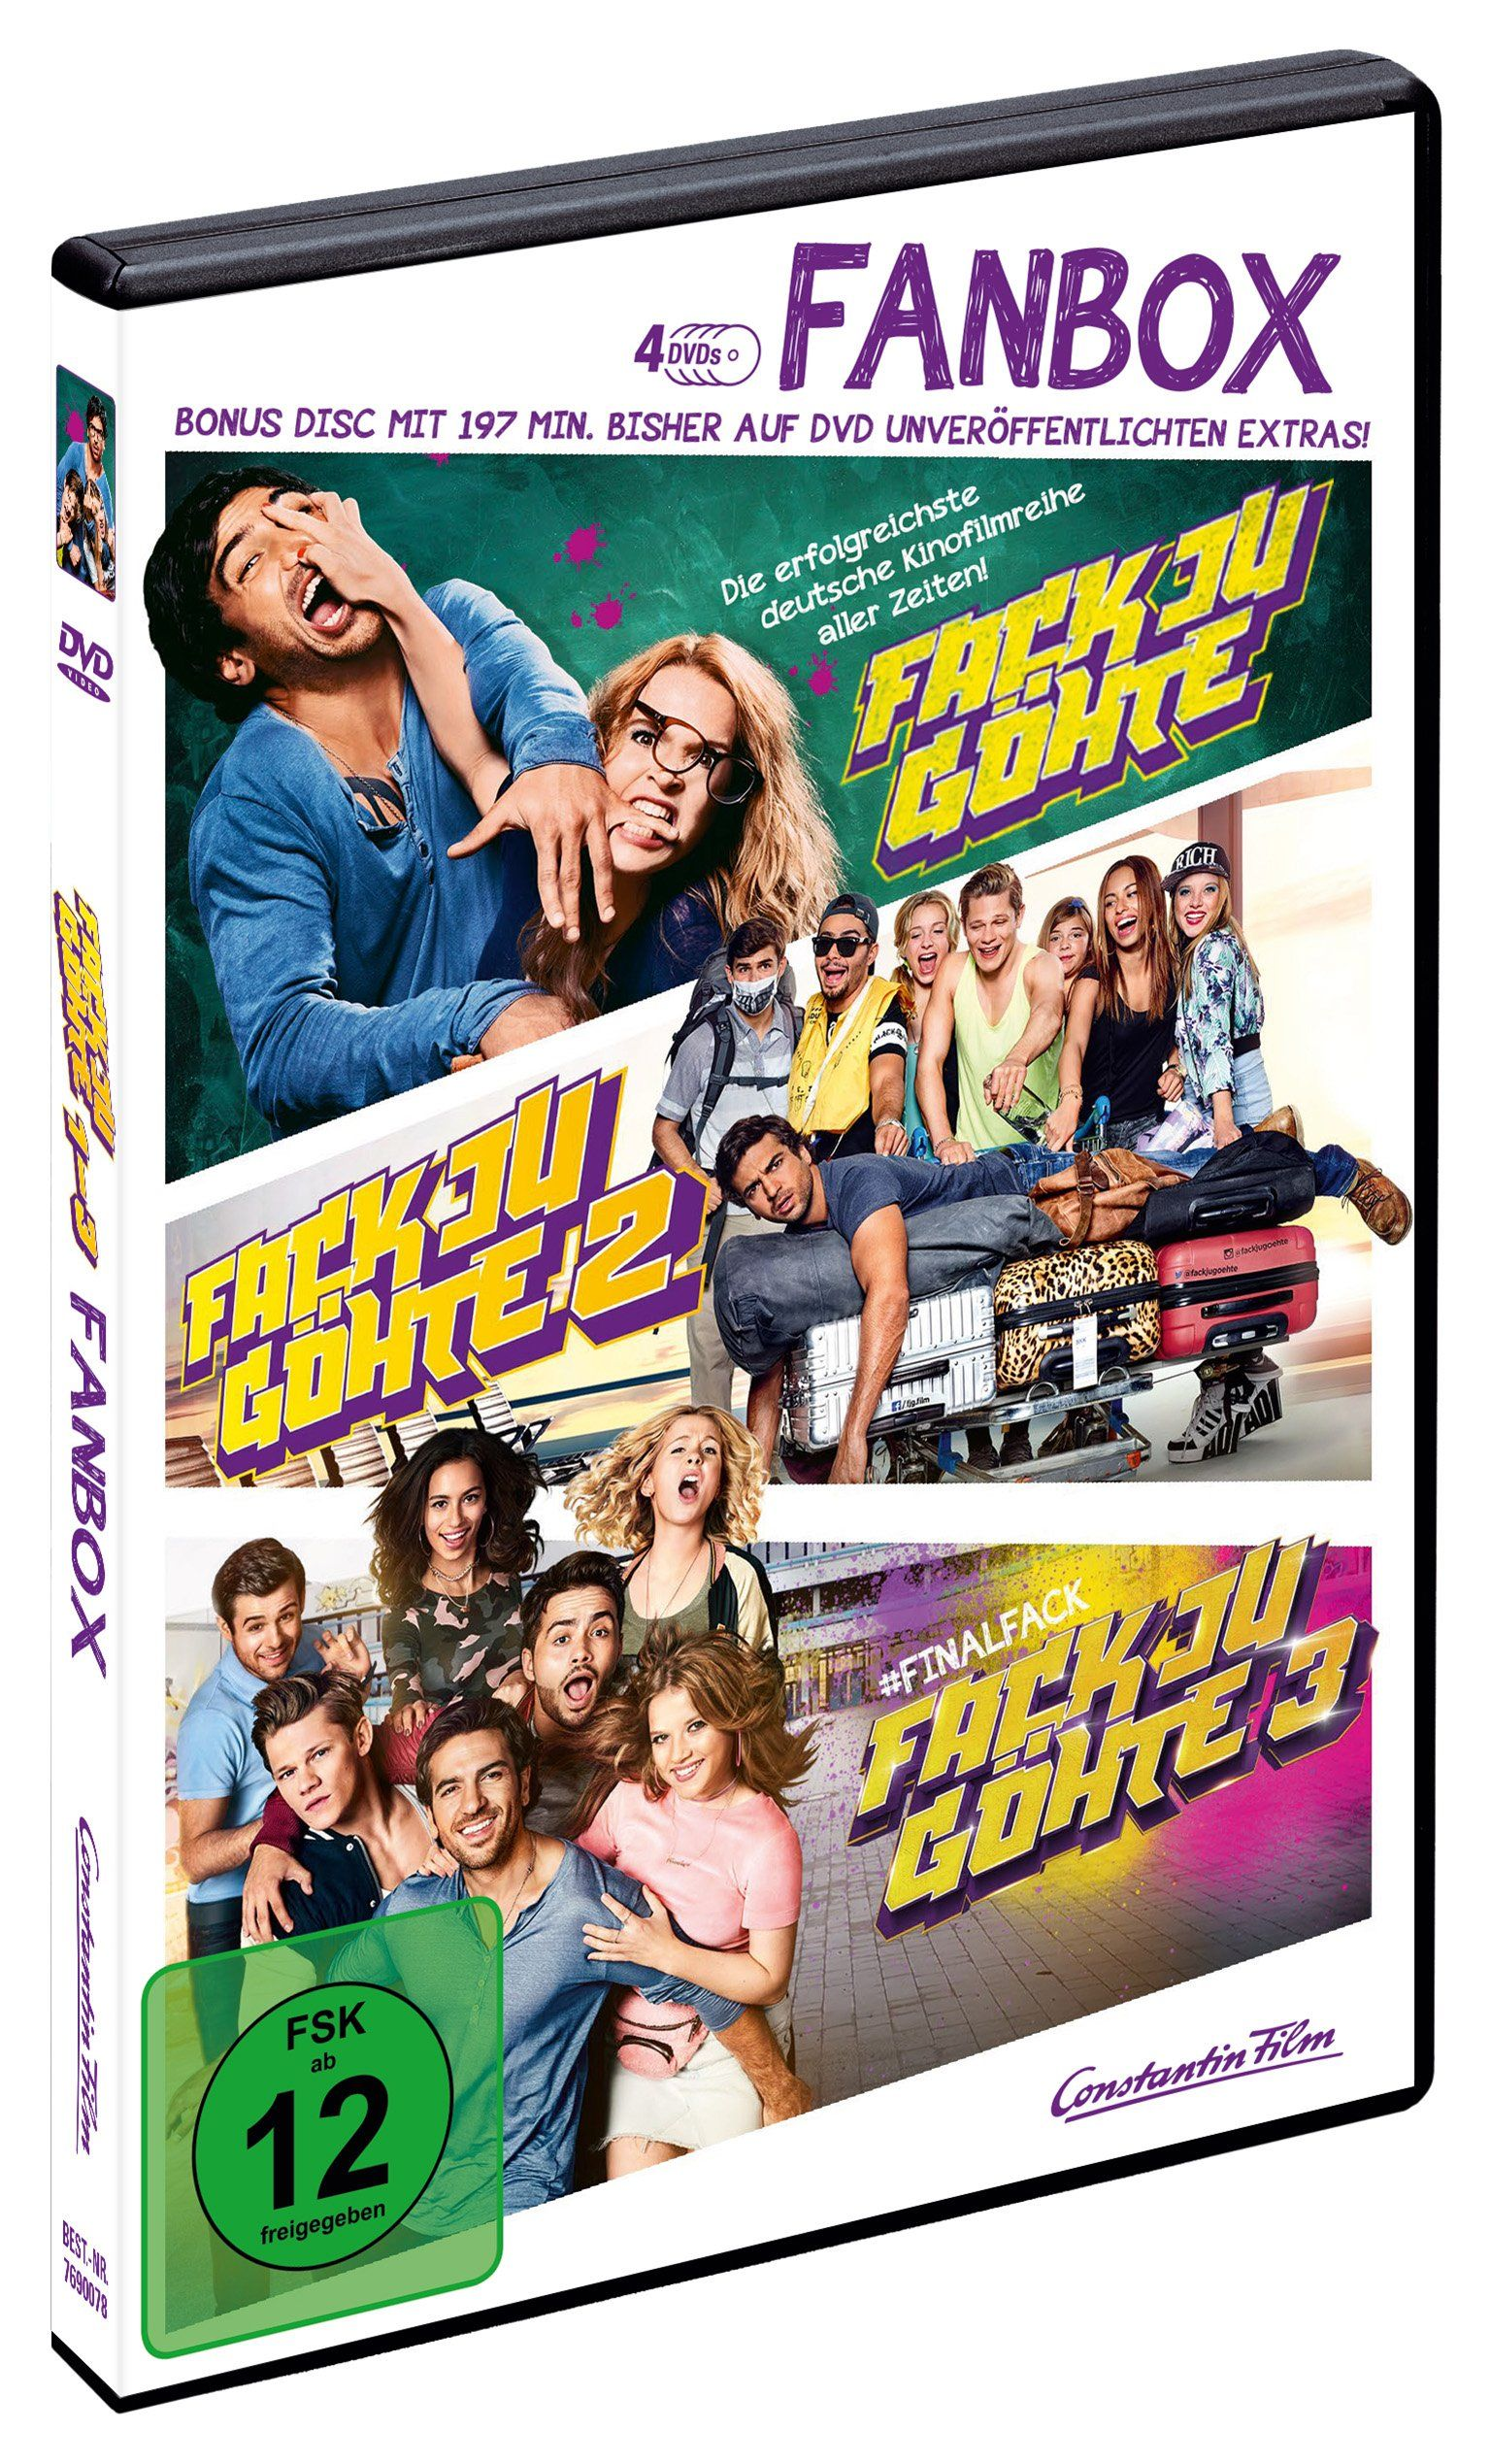 Fack Ju Ga Hte 1 3 Fanbox Alemania Dvd Ad Hte Ju Fack Dvd Dvd Fan Bilder